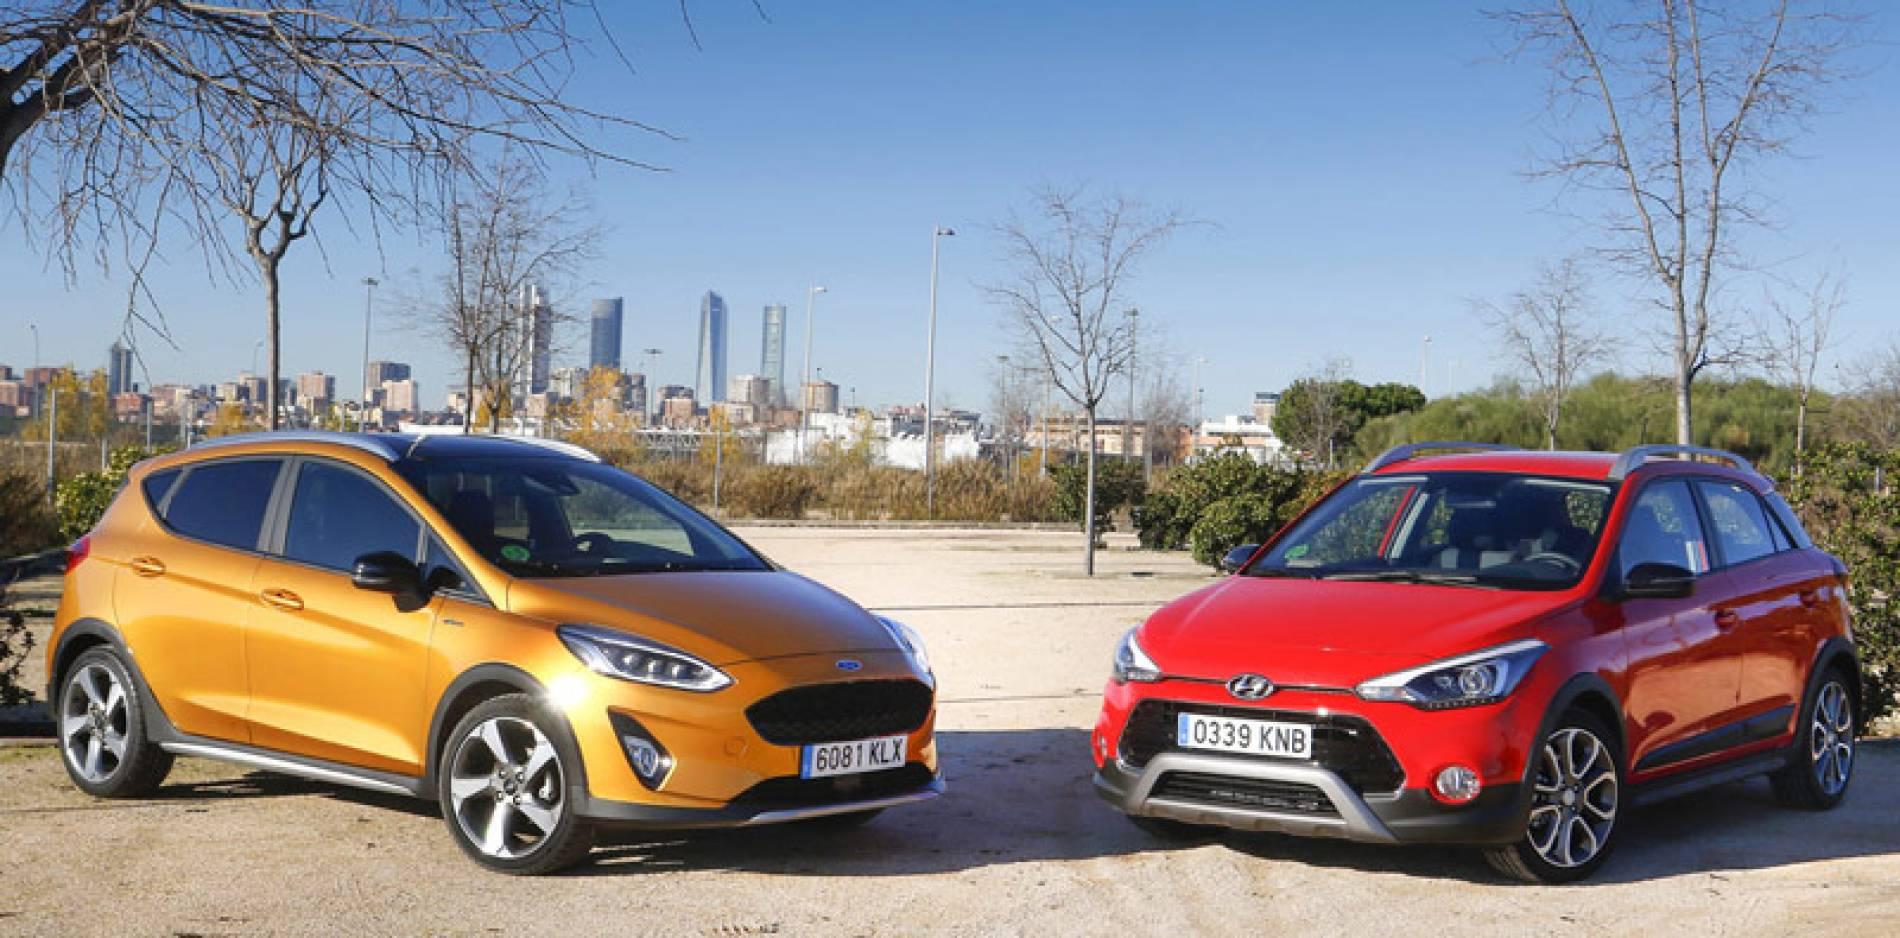 Comparativa de urbanos con espíritu aventurero, Ford Fiesta Active vs Hyundai i20 Active